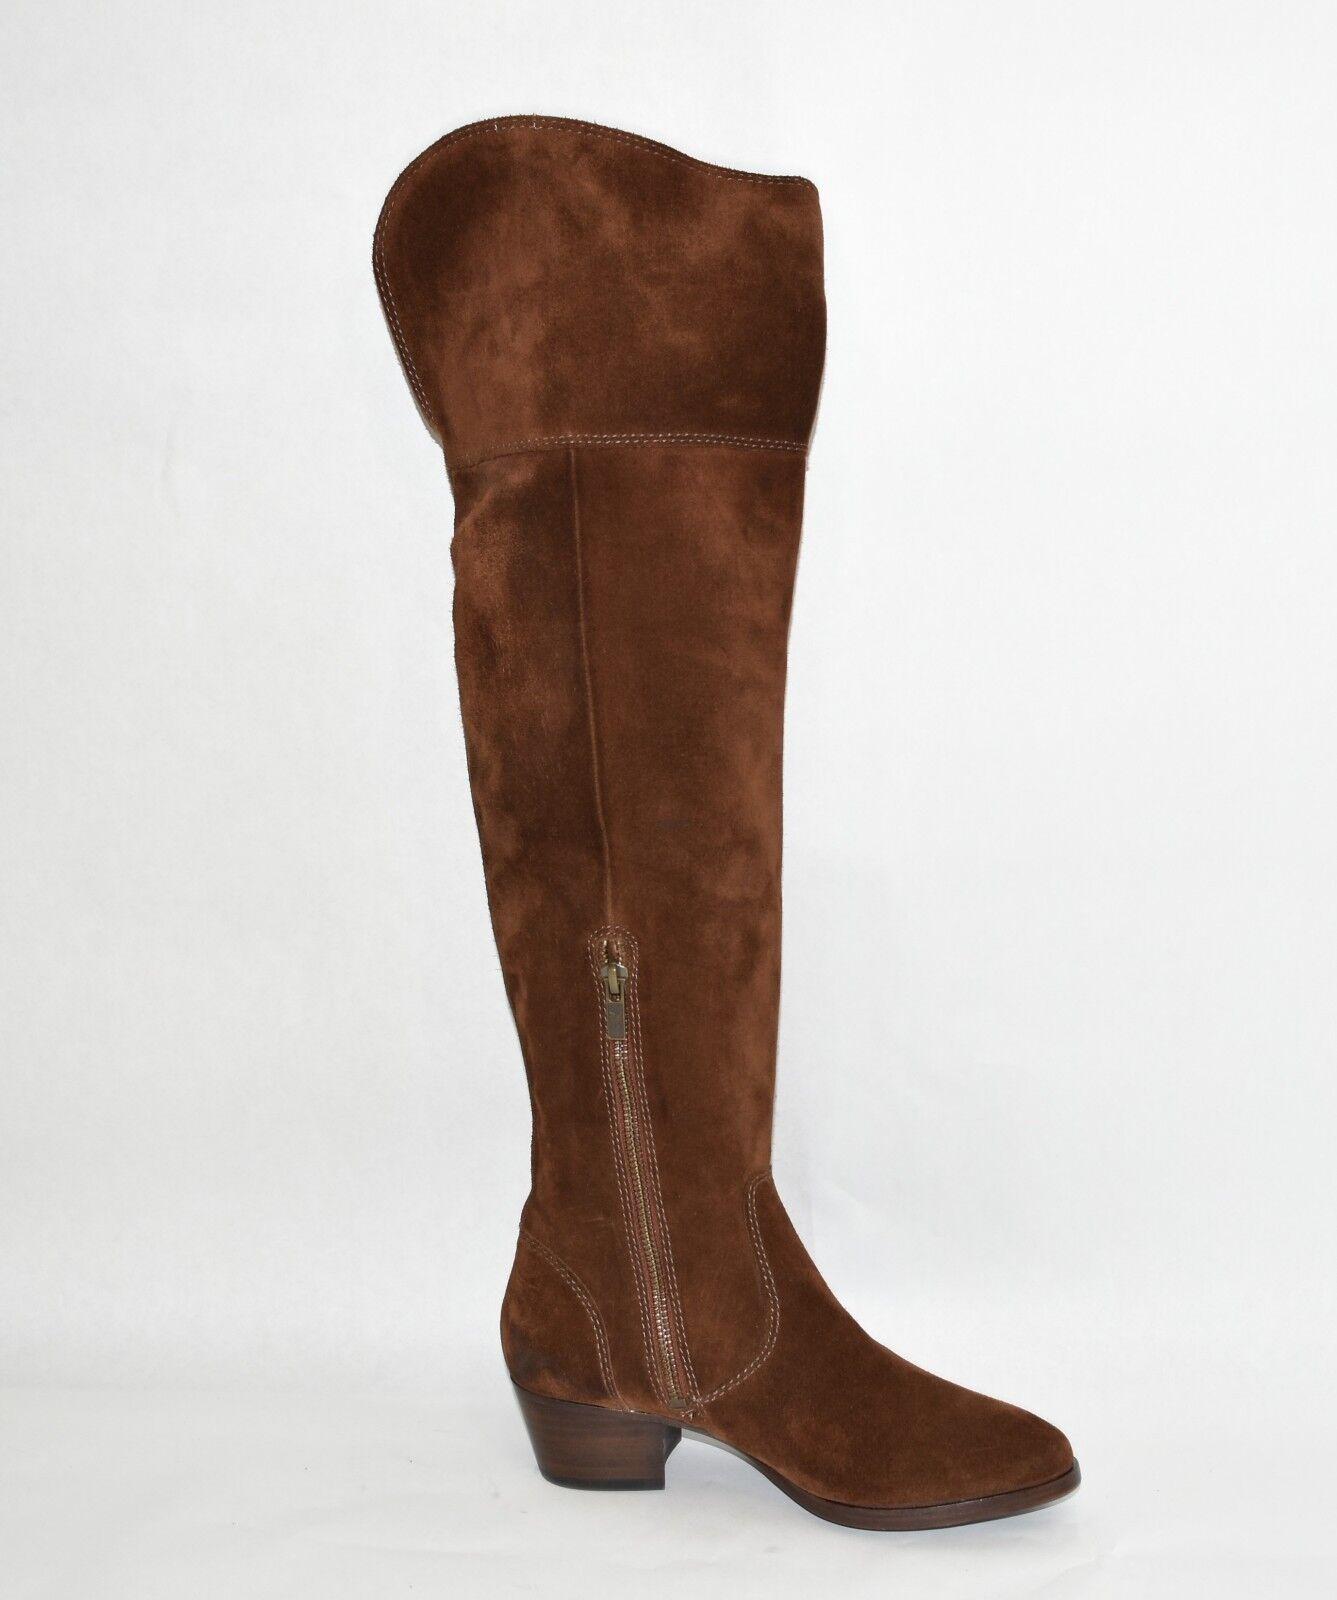 New  Frye Frye Frye 'Clara' Tassel Over the Knee Boot Brown Suede 3475370 Size 5.5 0ae95d